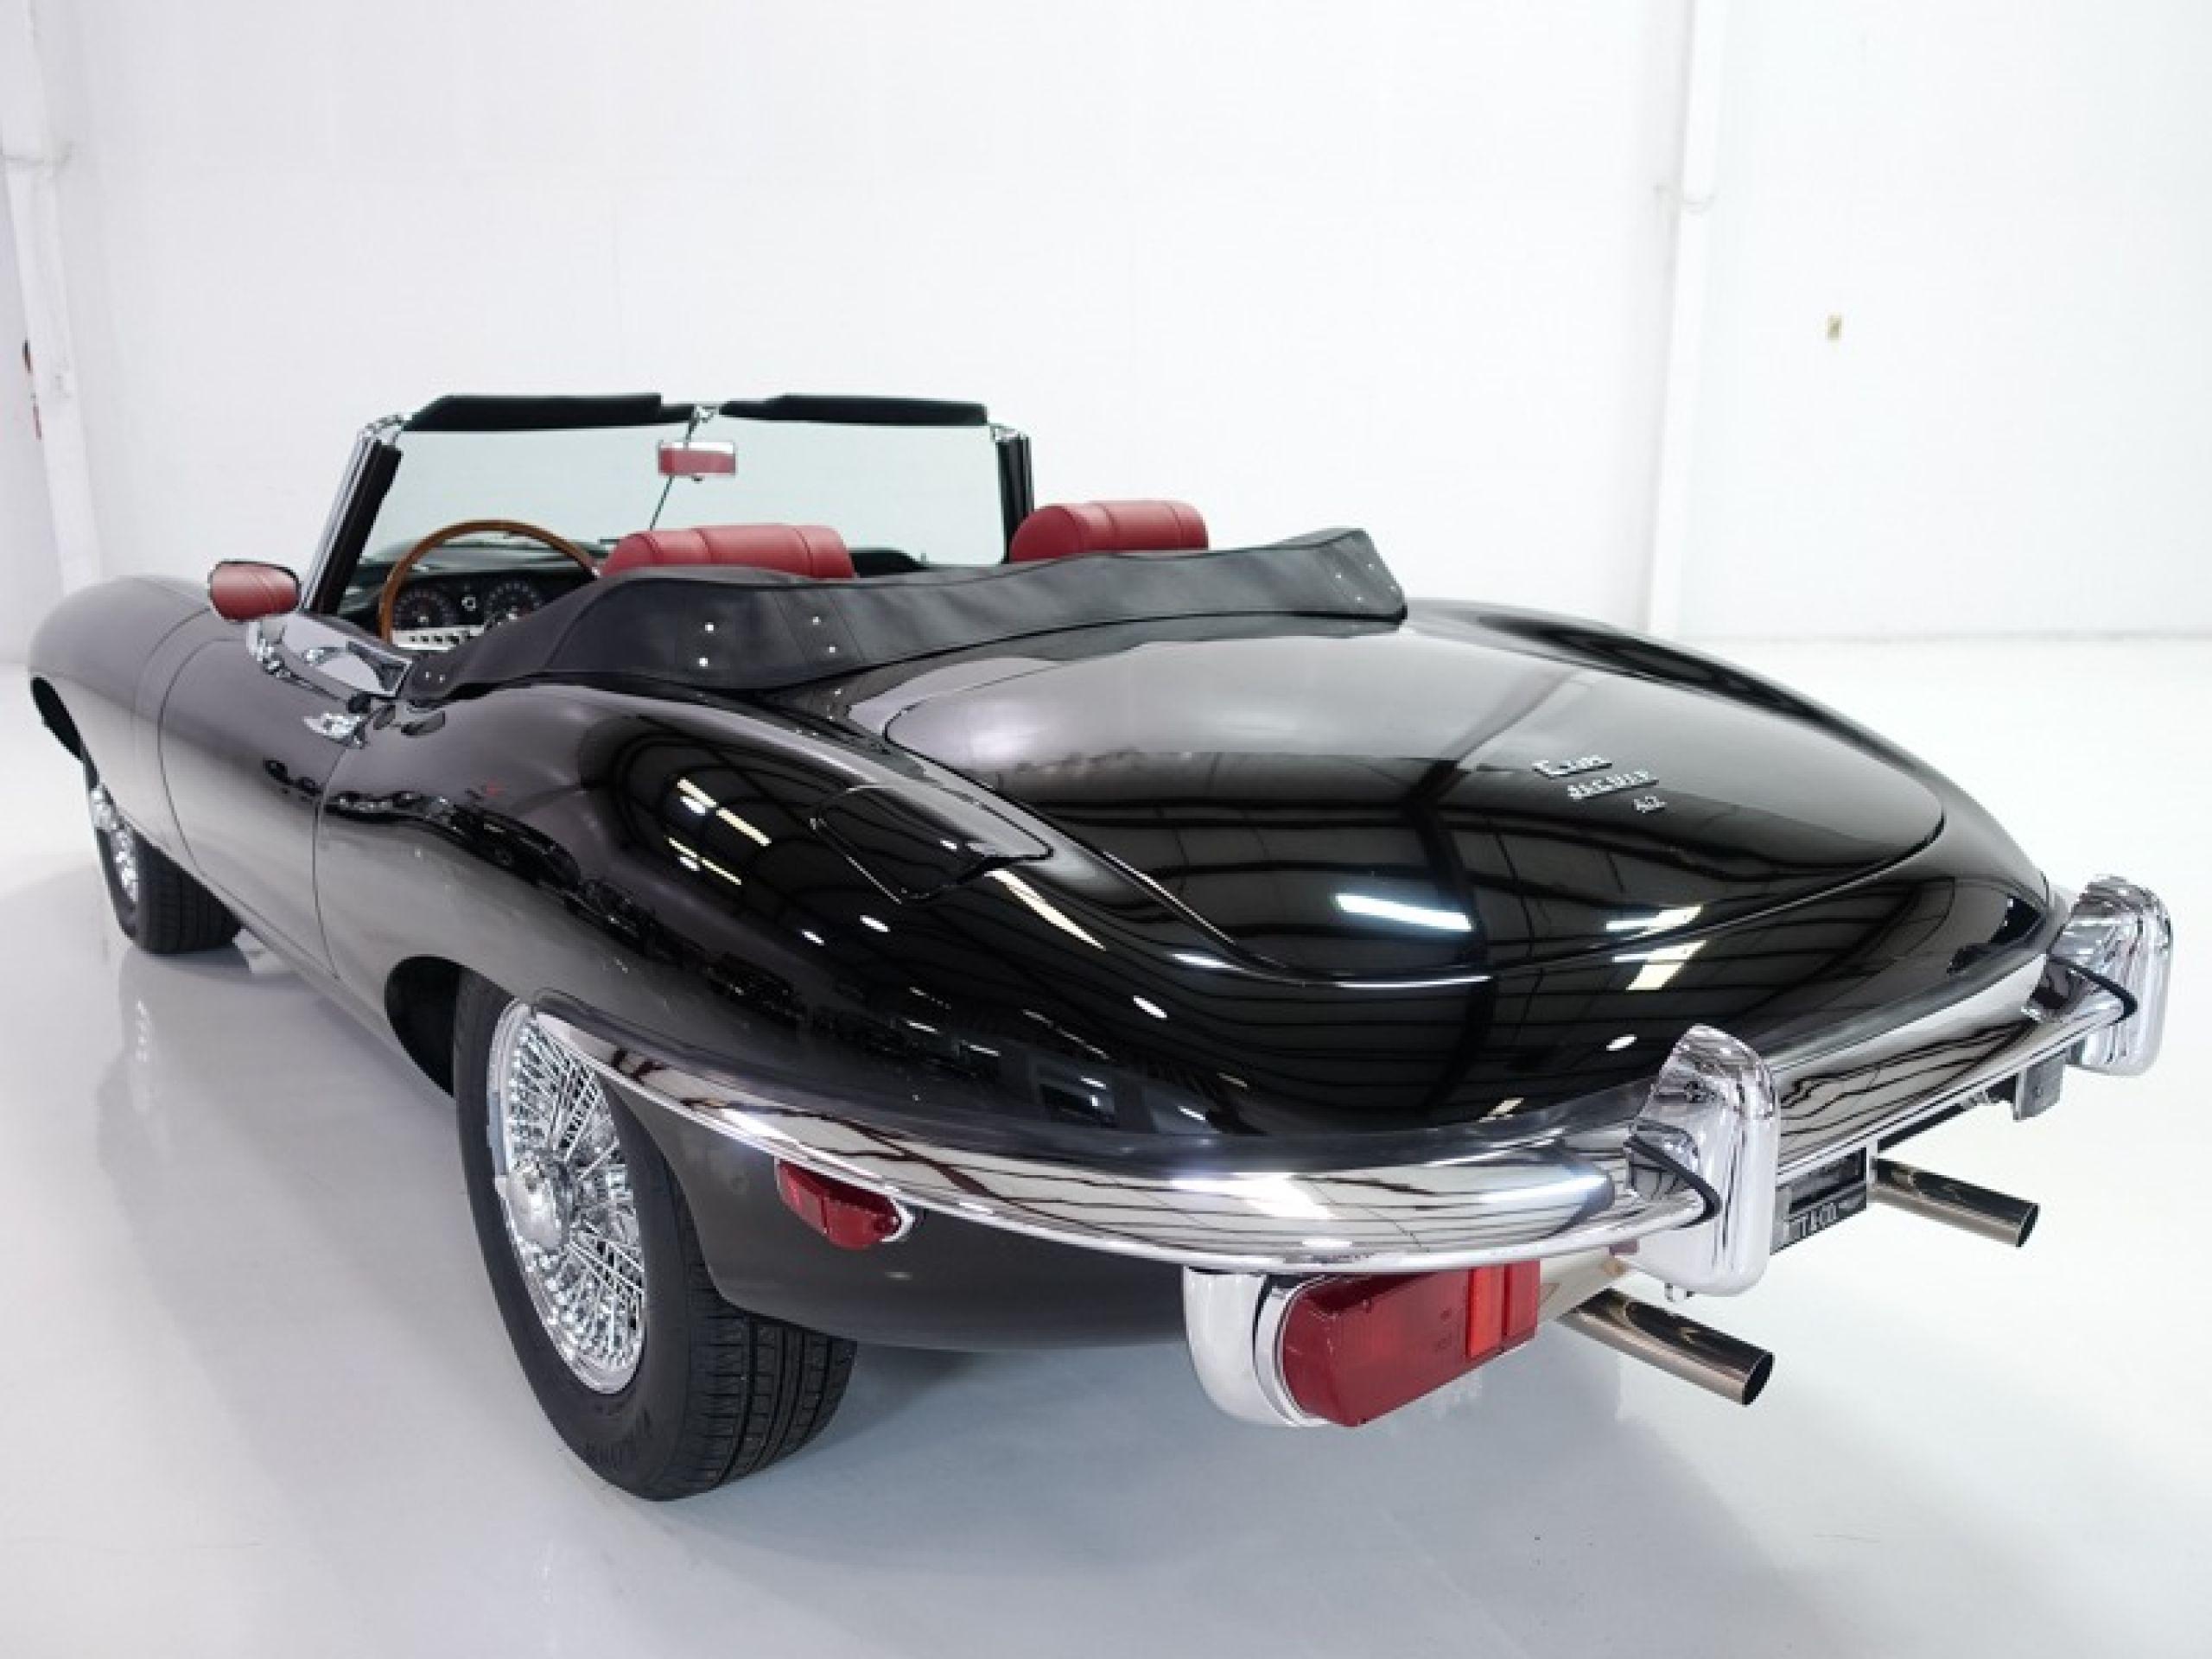 1971 Jaguar E-Type Series II Roadster